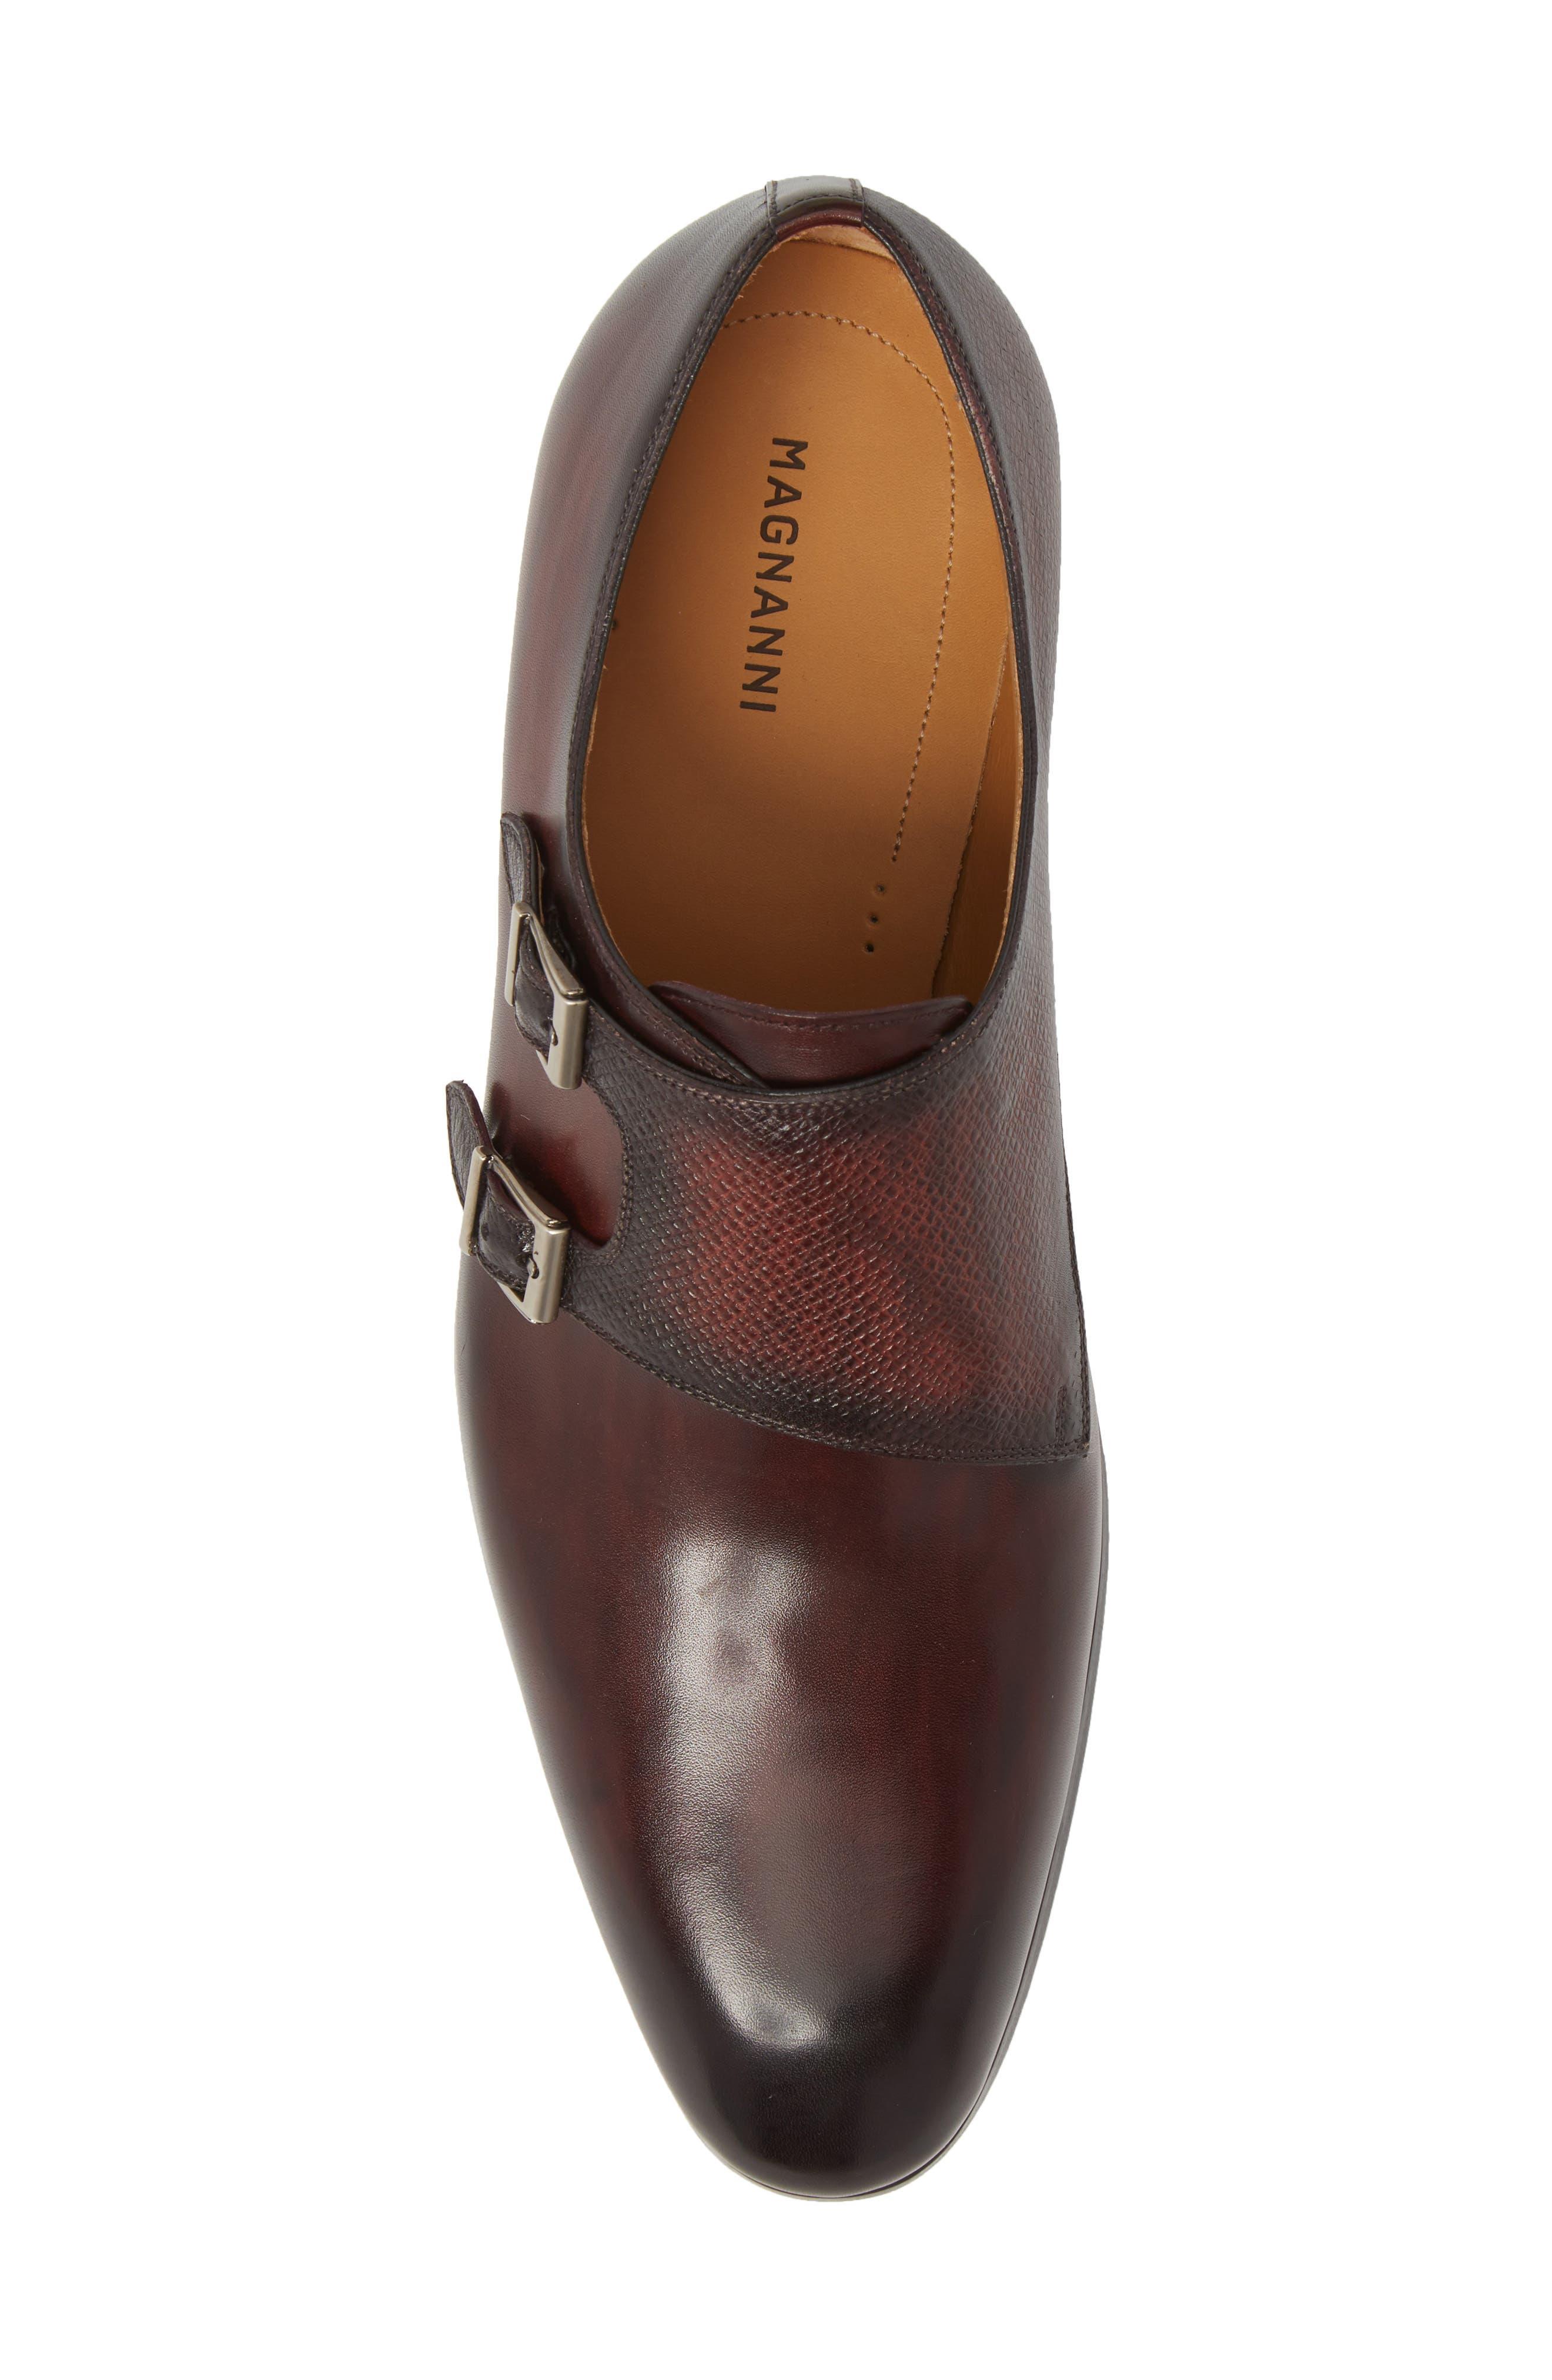 Arlo Pebbled Monk Shoe,                             Alternate thumbnail 5, color,                             BURGUNDY LEATHER